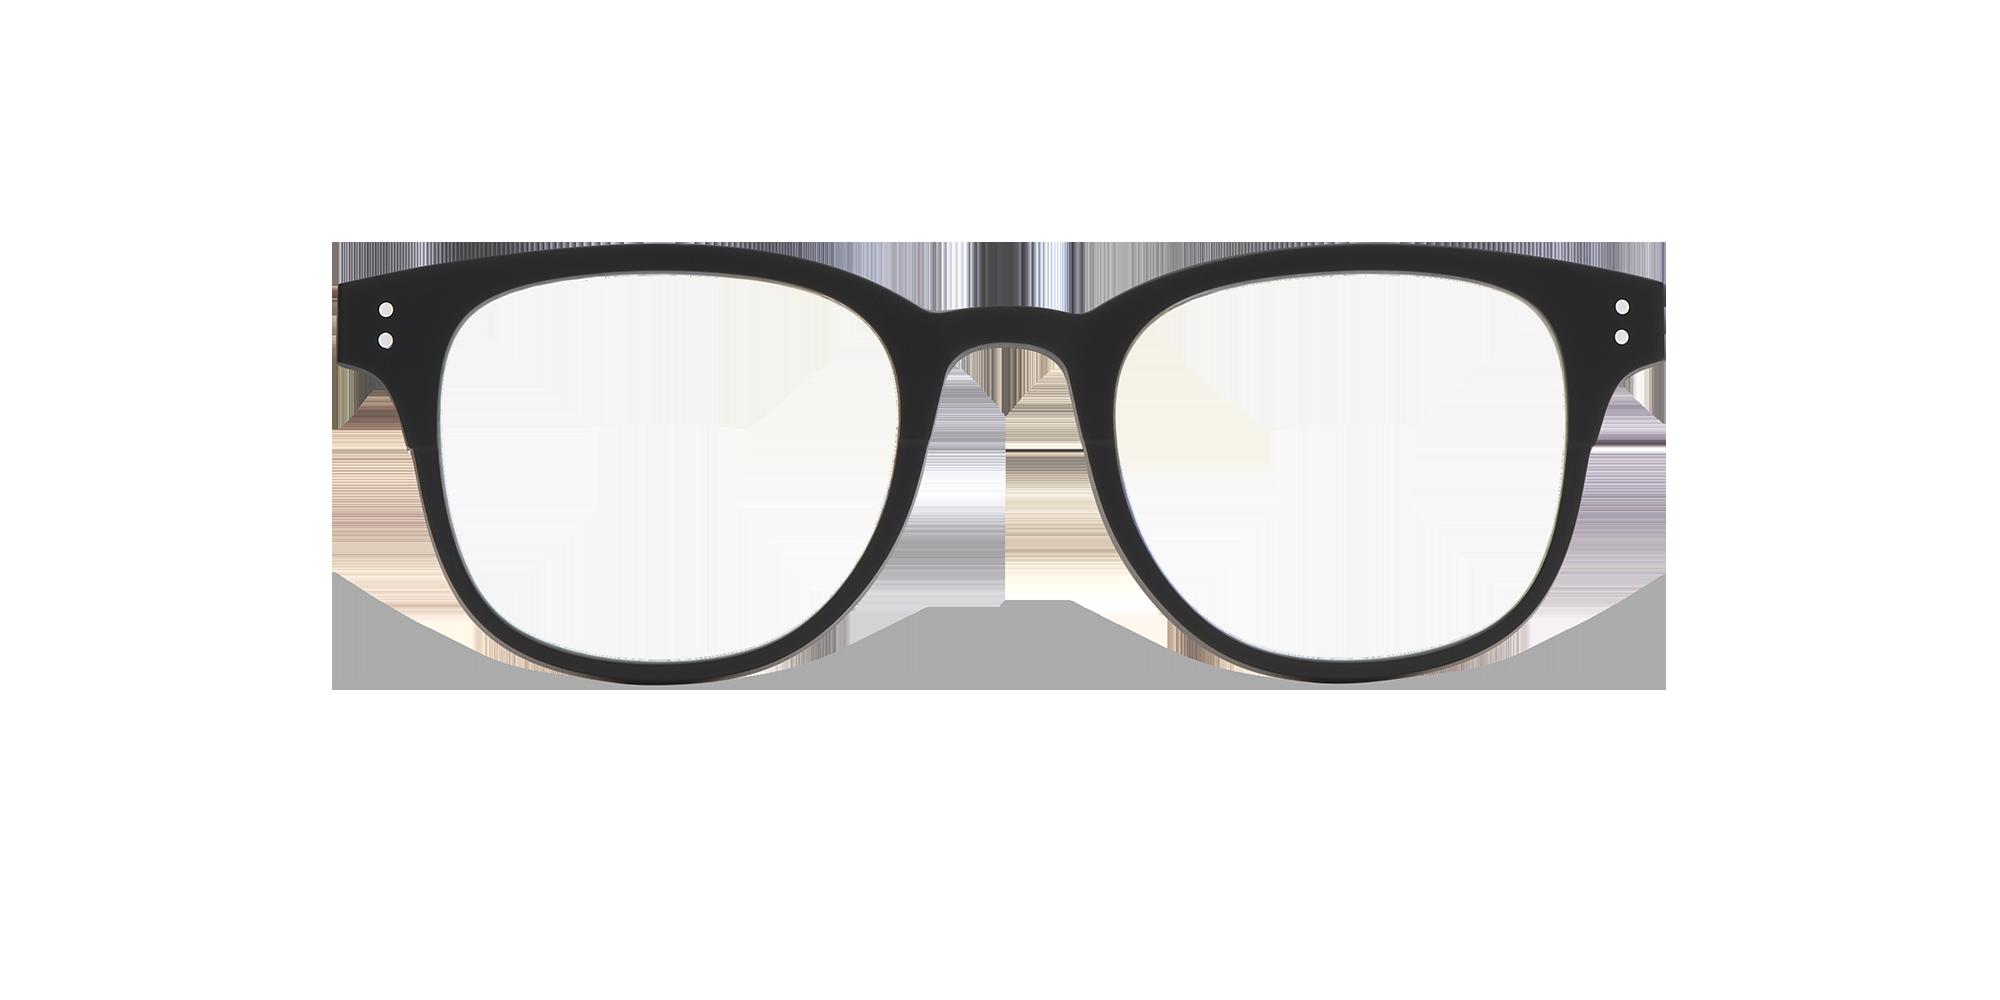 afflelou/france/products/smart_clip/clips_glasses/TMK34BBBK015021.png